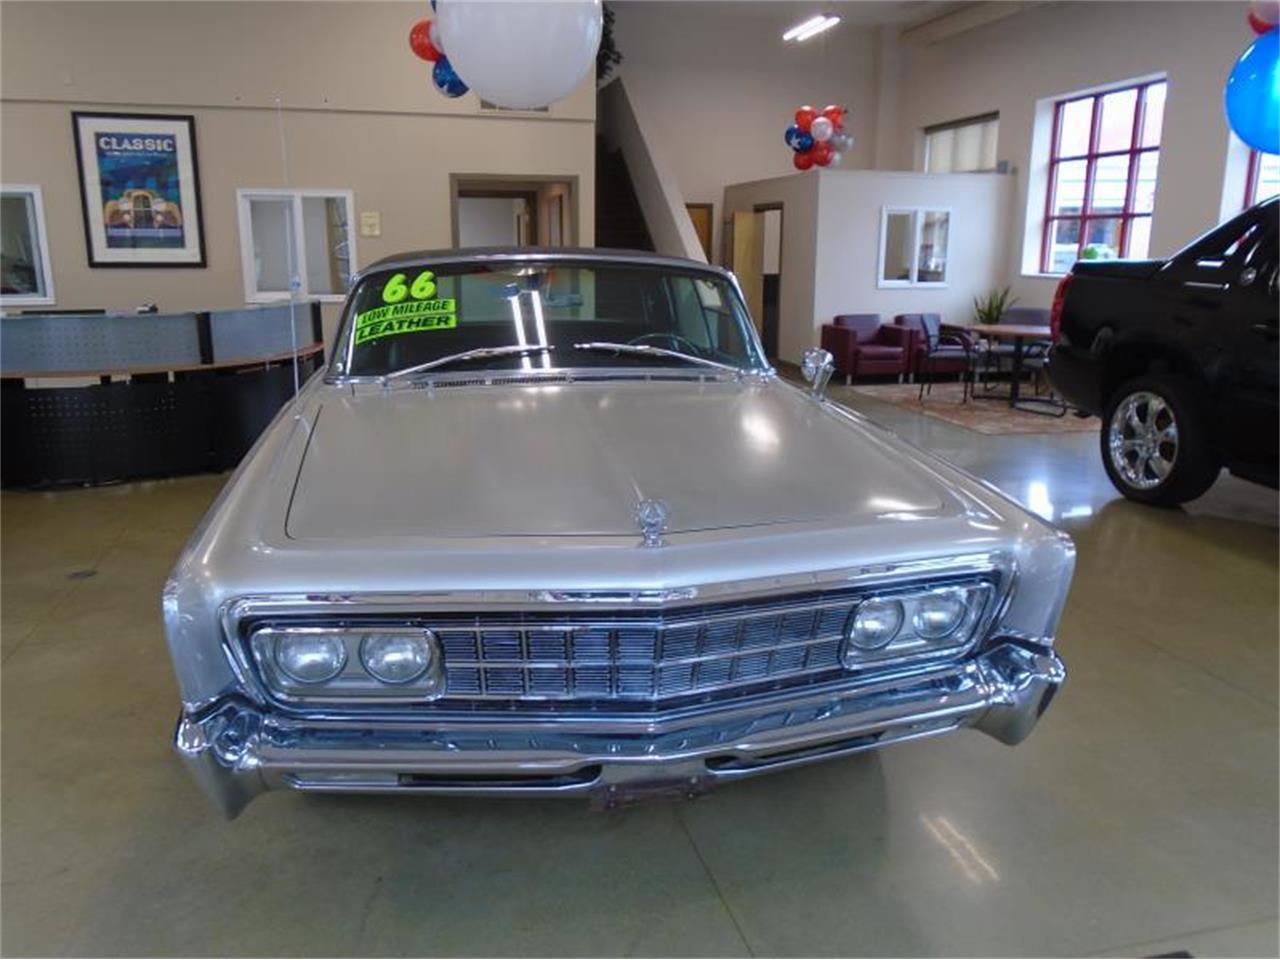 1966 Chrysler Imperial for Sale | ClassicCars.com | CC-1140778